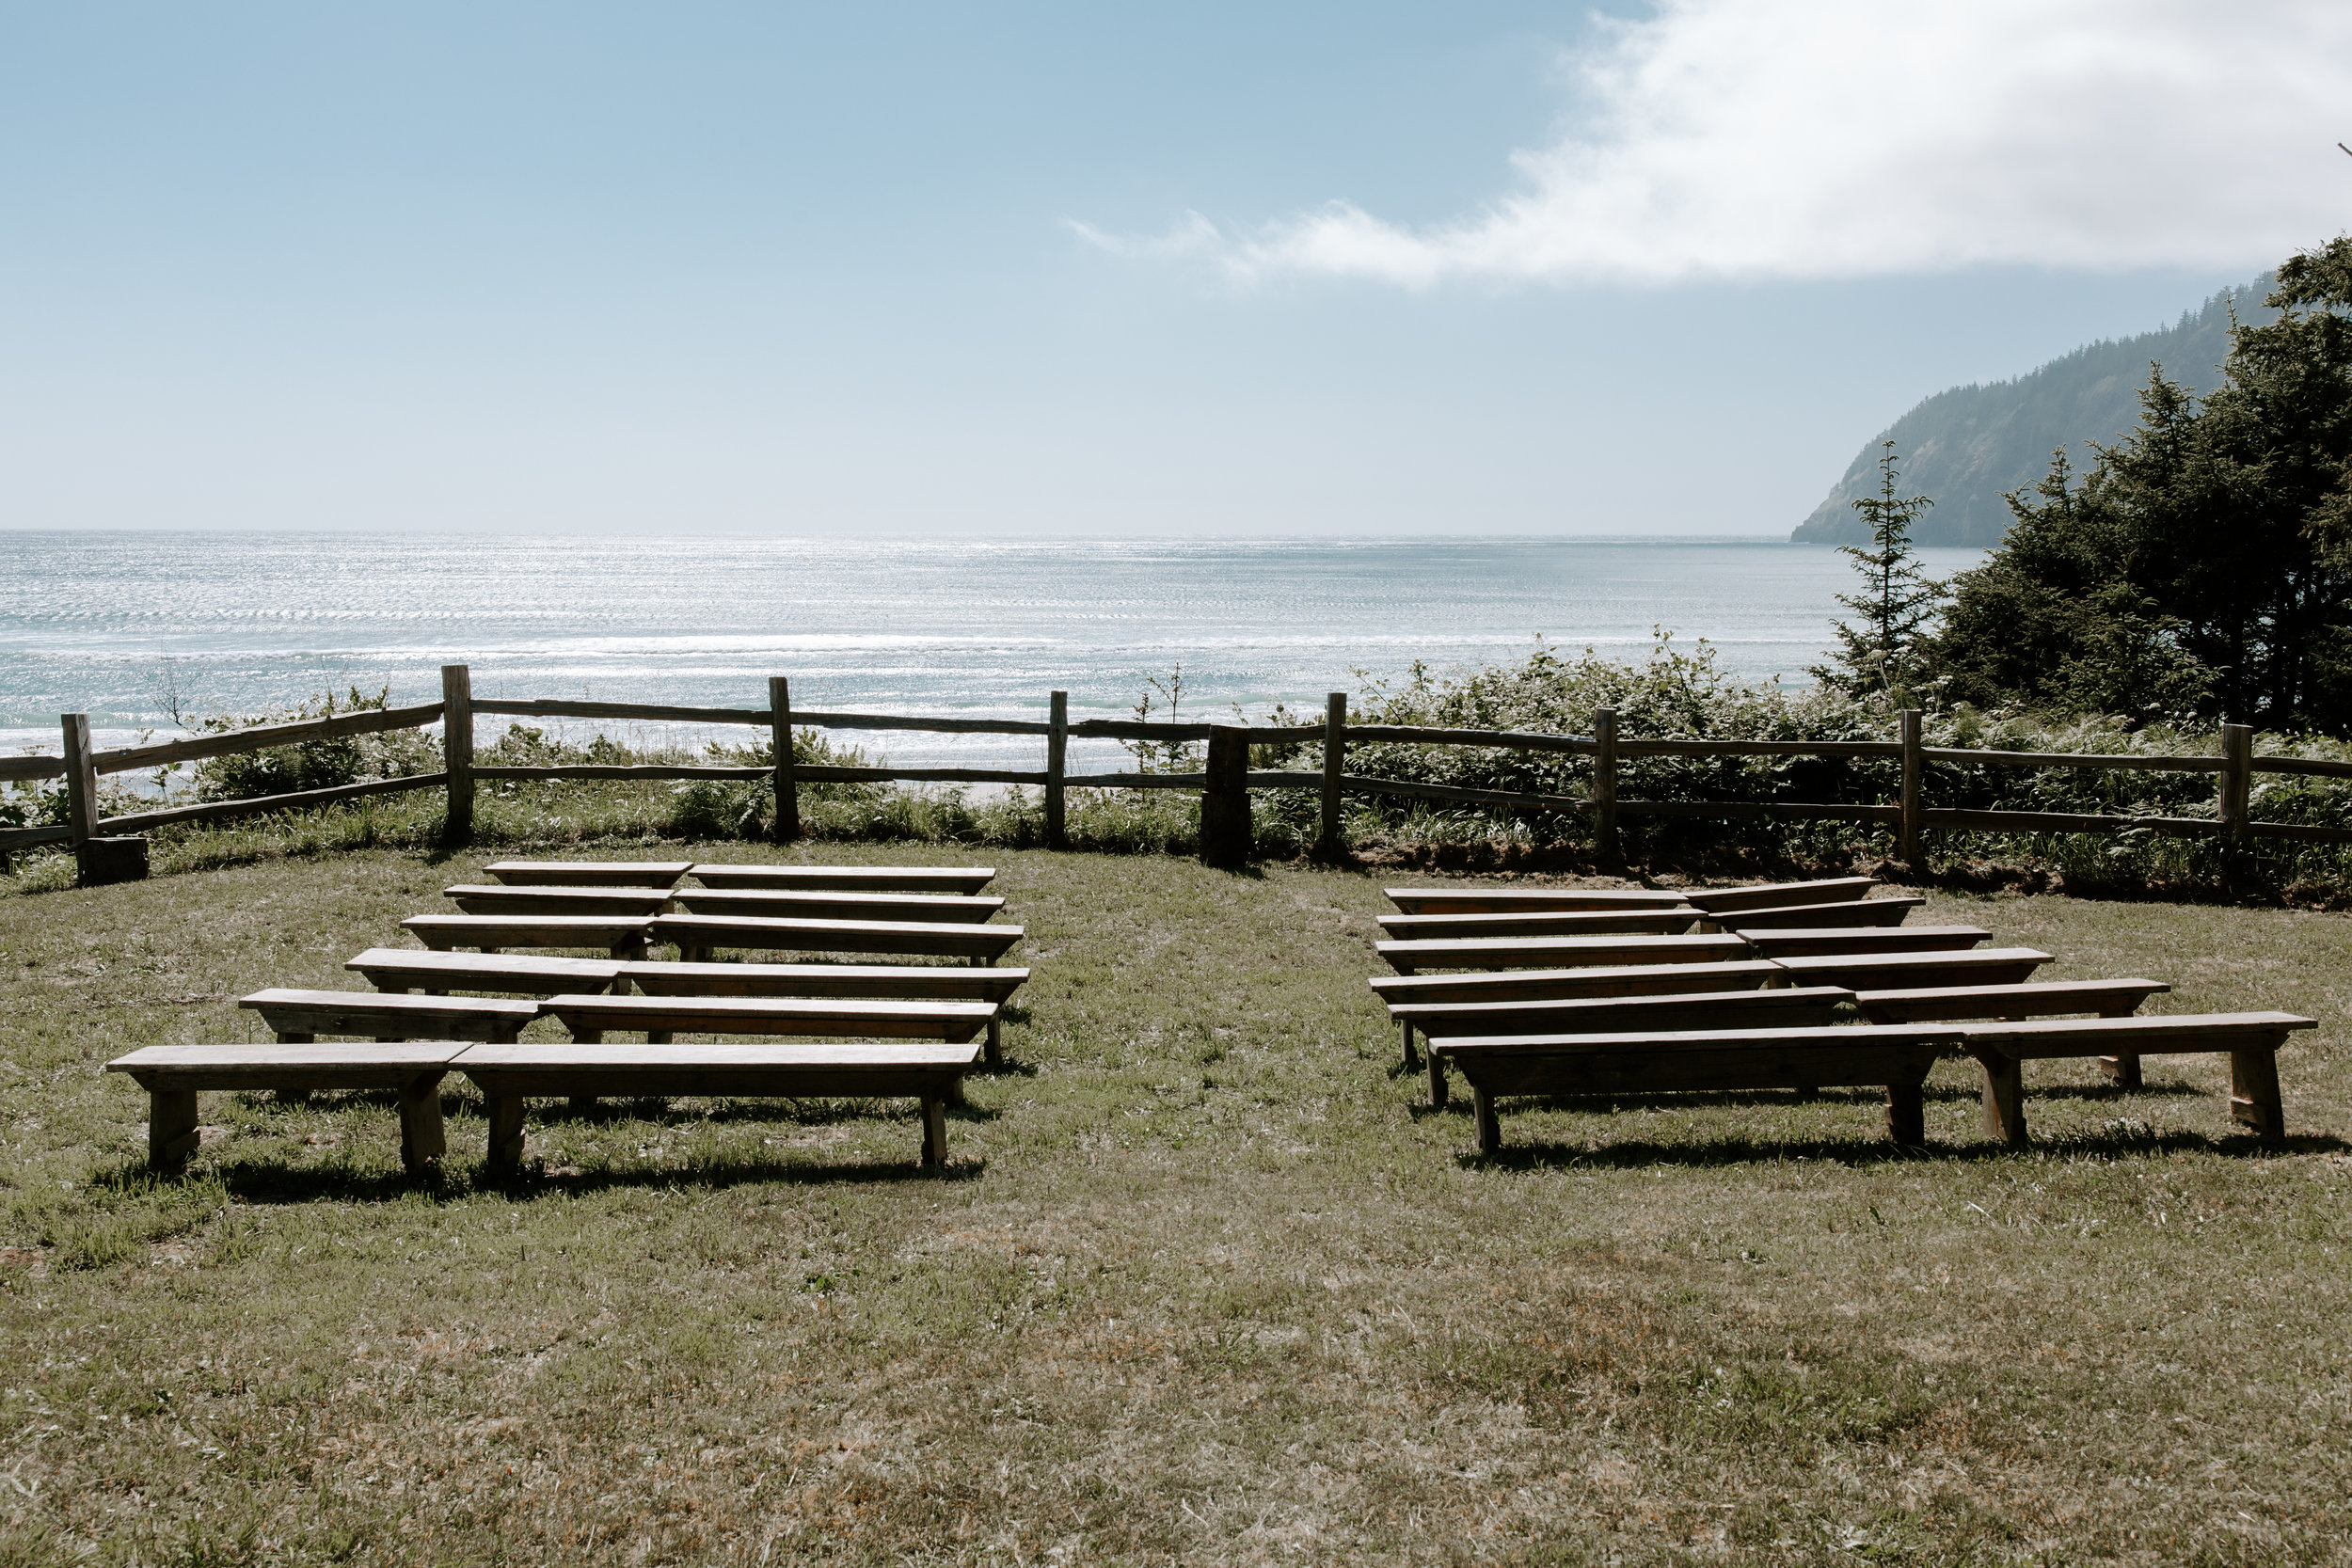 Oregon Wedding Photographer |   Camp Clark Venue | Rustic Bloom Photography